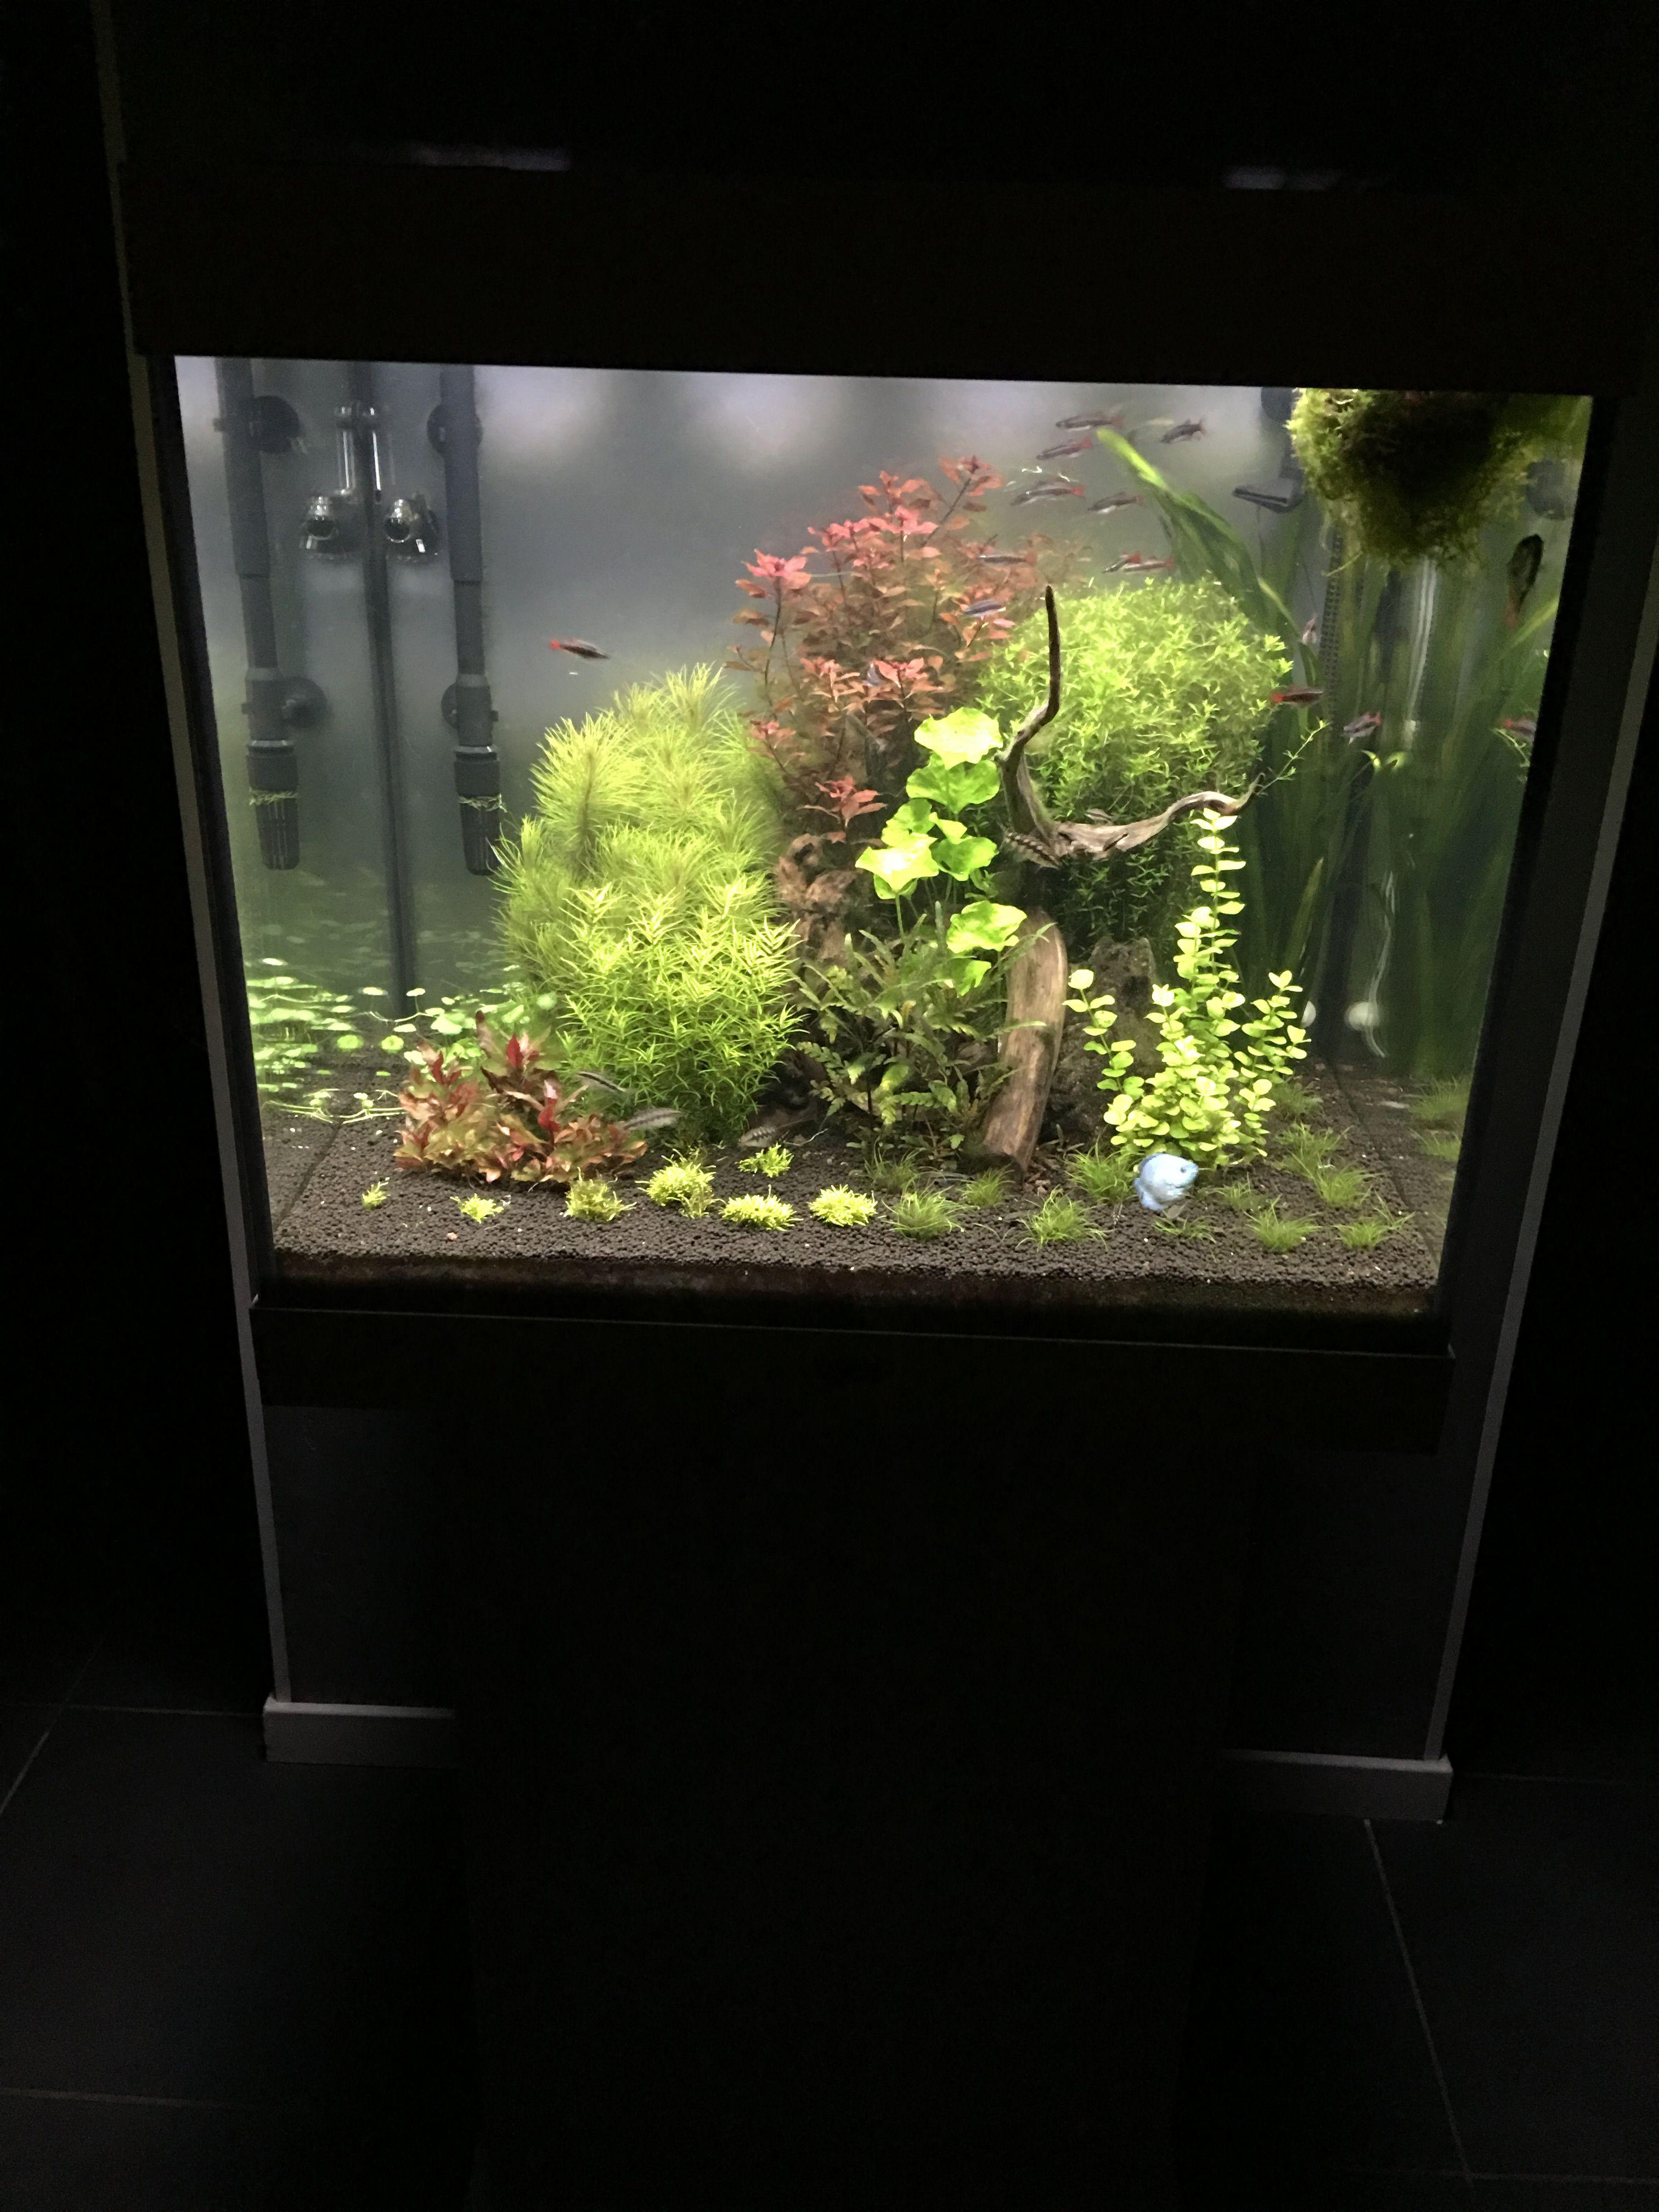 Juwel Lido 200 (Asiatique) - Daytime LED 80w - JBL i1501 - Page 6 122295IMG1409